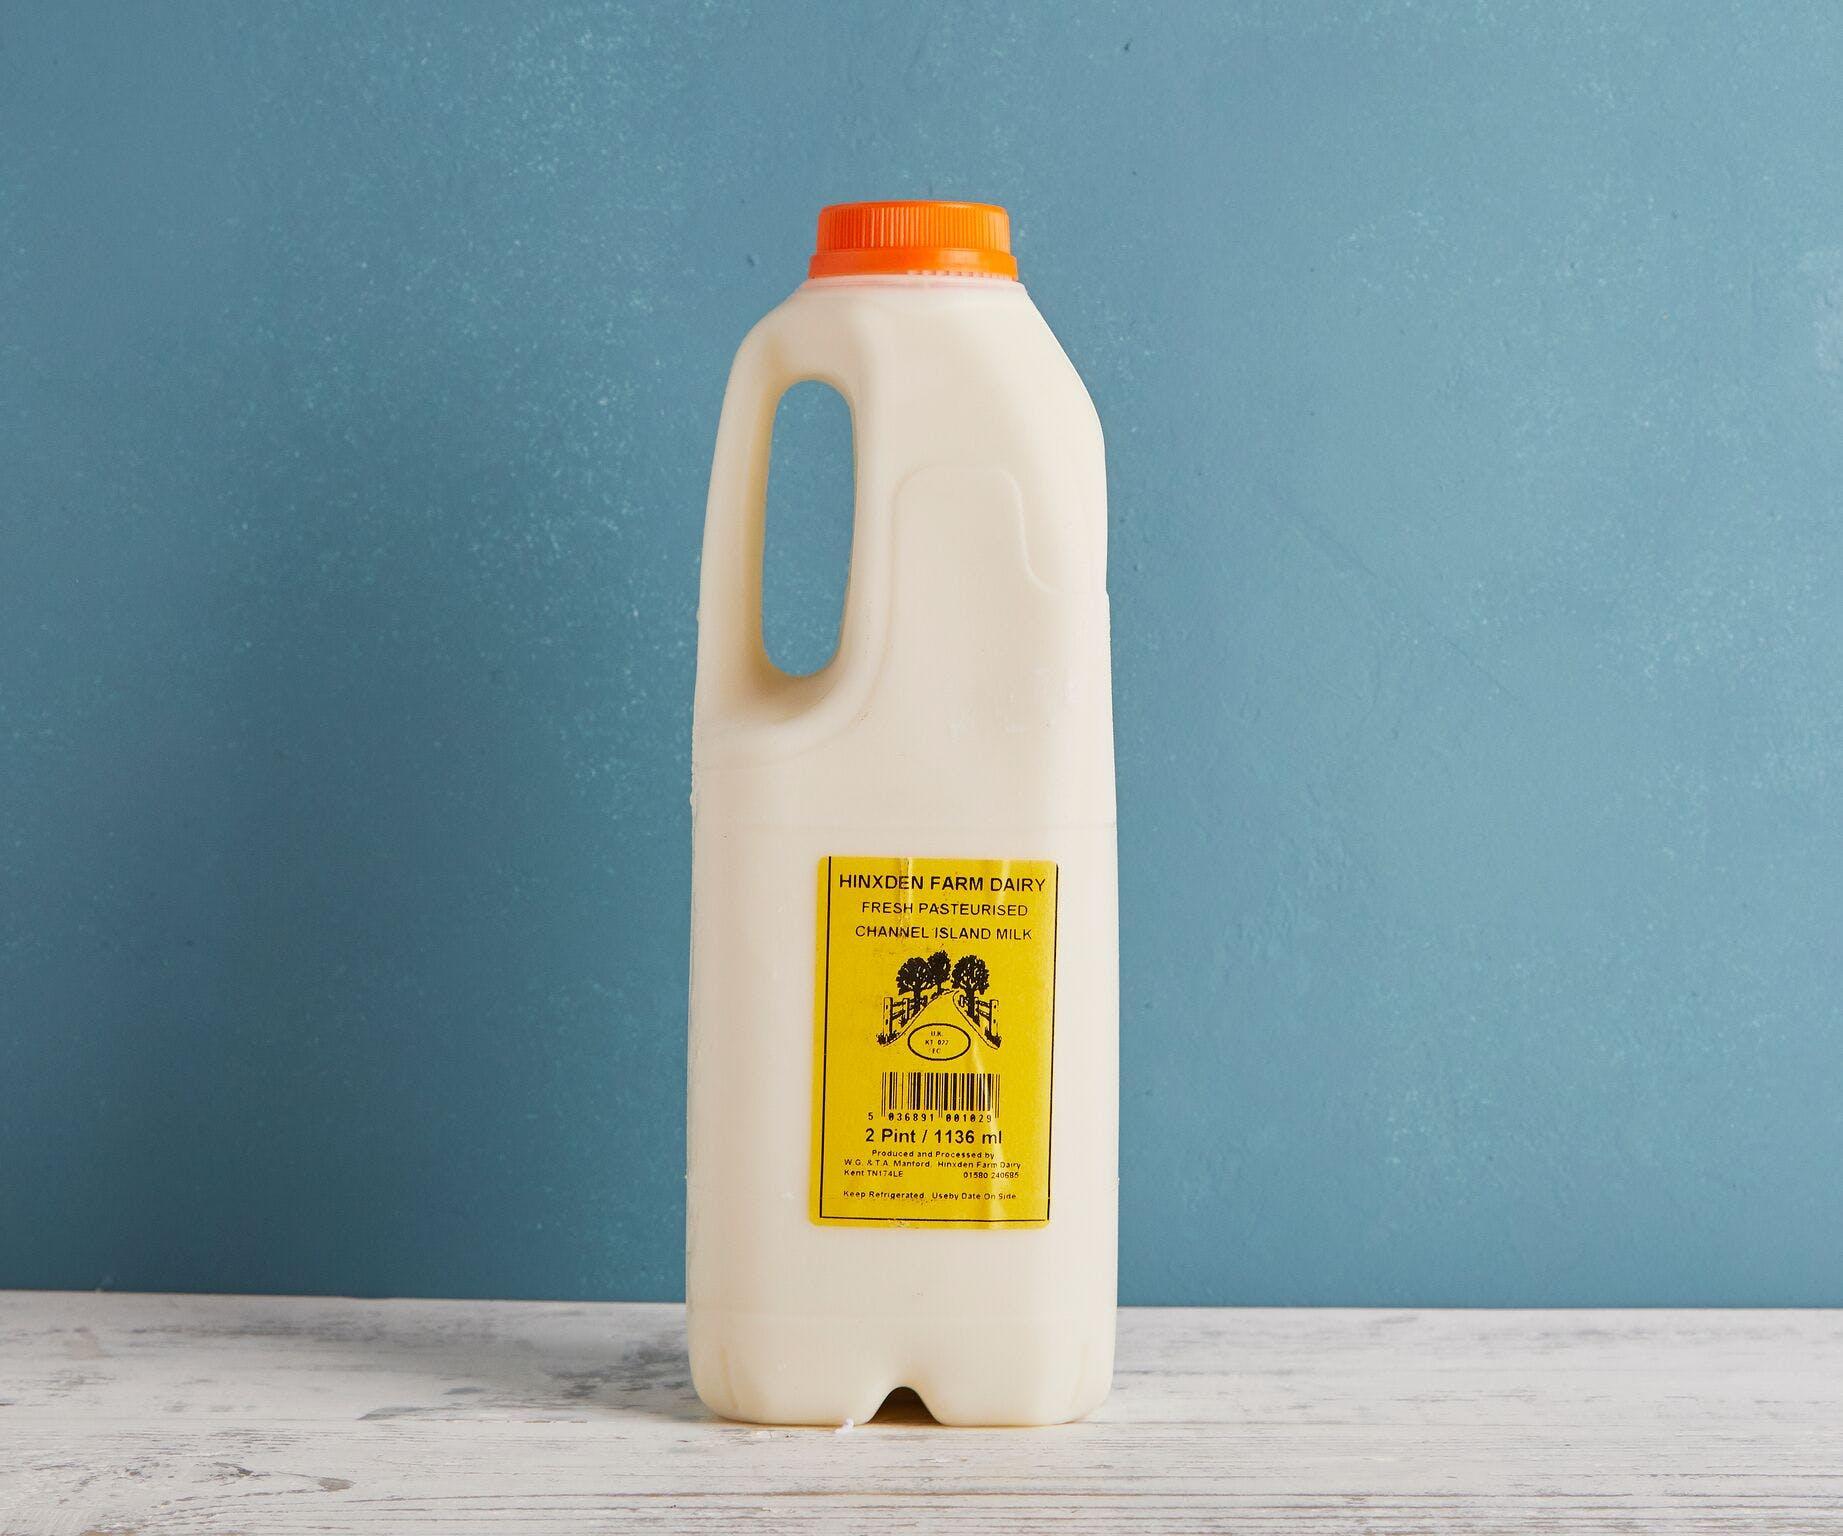 Channel Island Milk